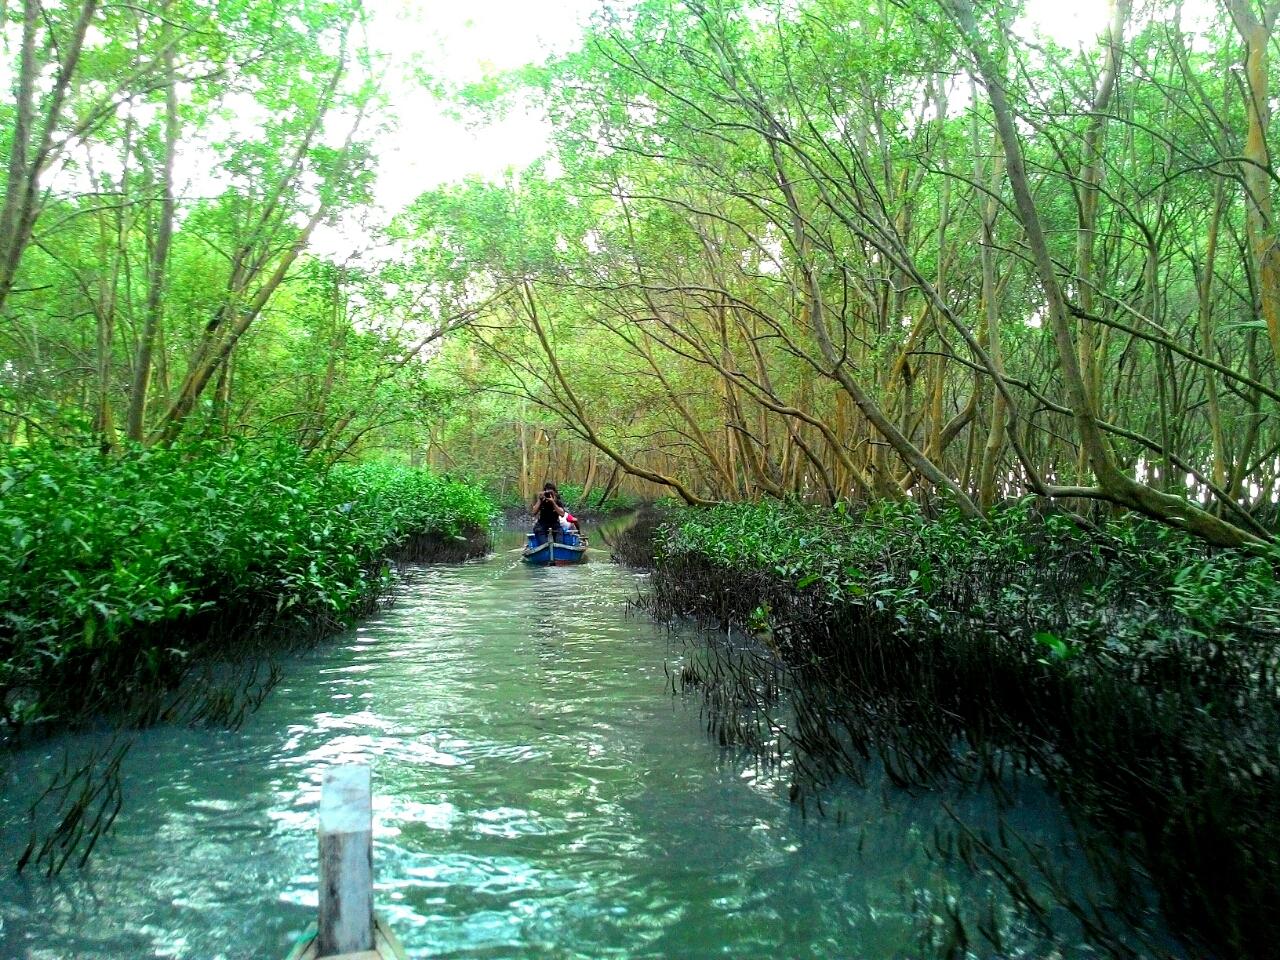 Wisata Mangrove Page 2 Lampung Center Marga Sari Timur Hutan